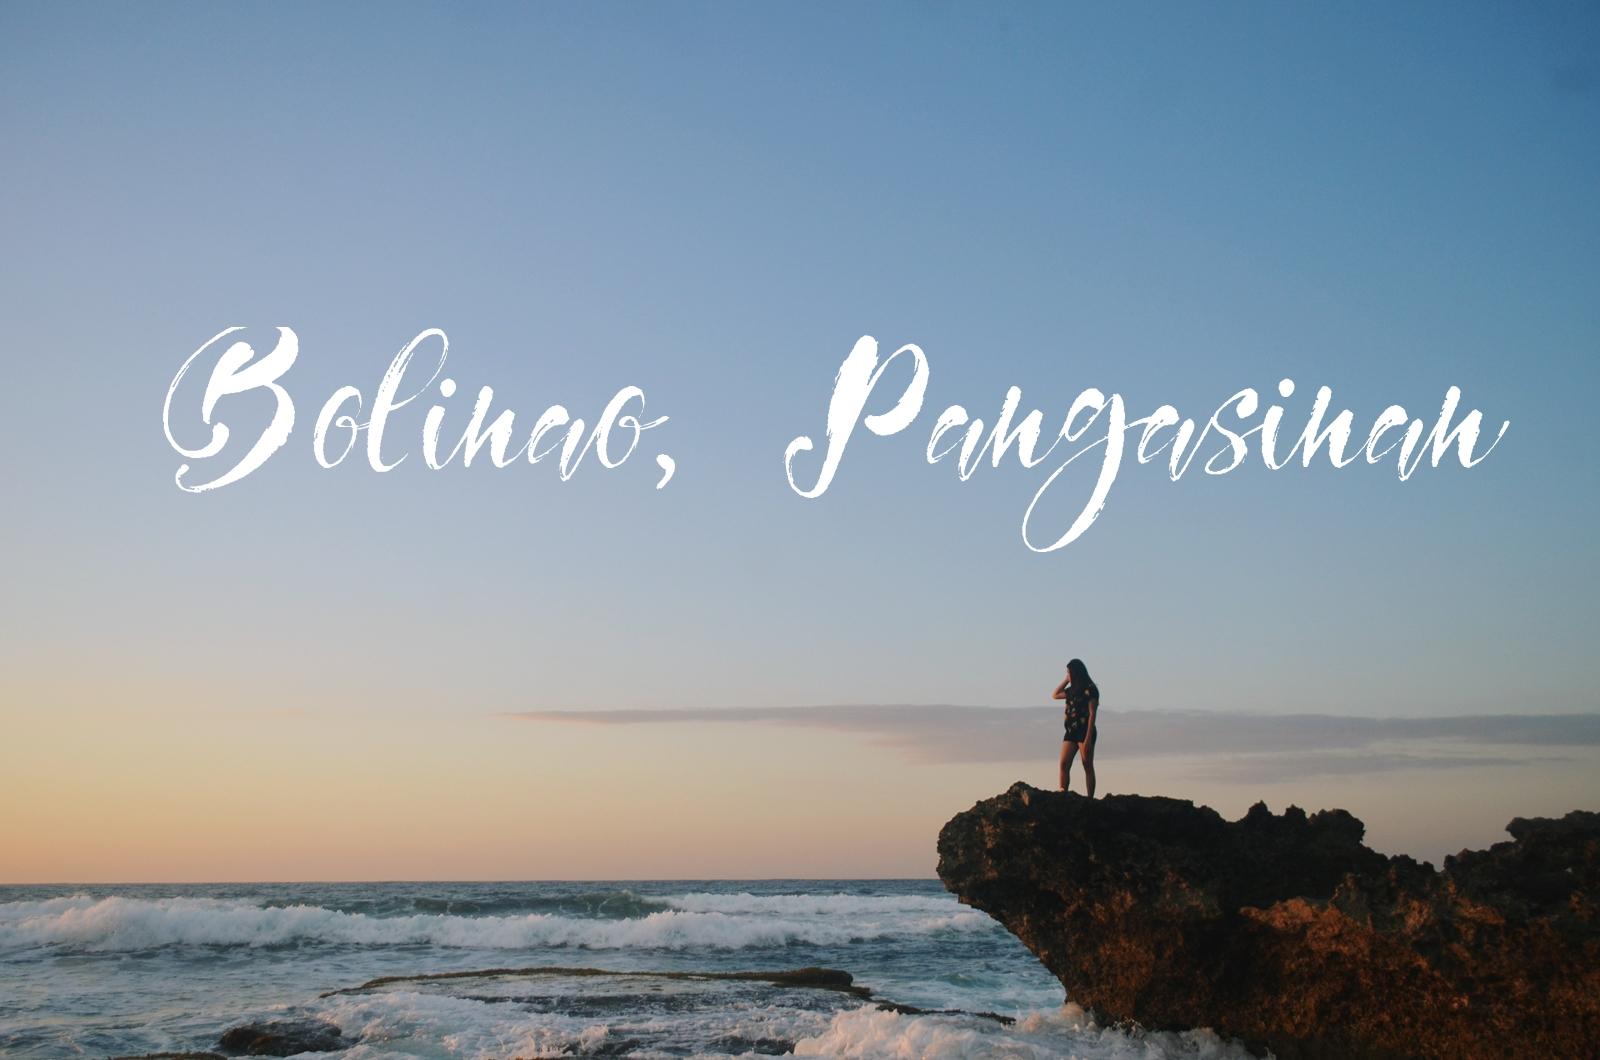 Bolinao, Pangasinan Rockview